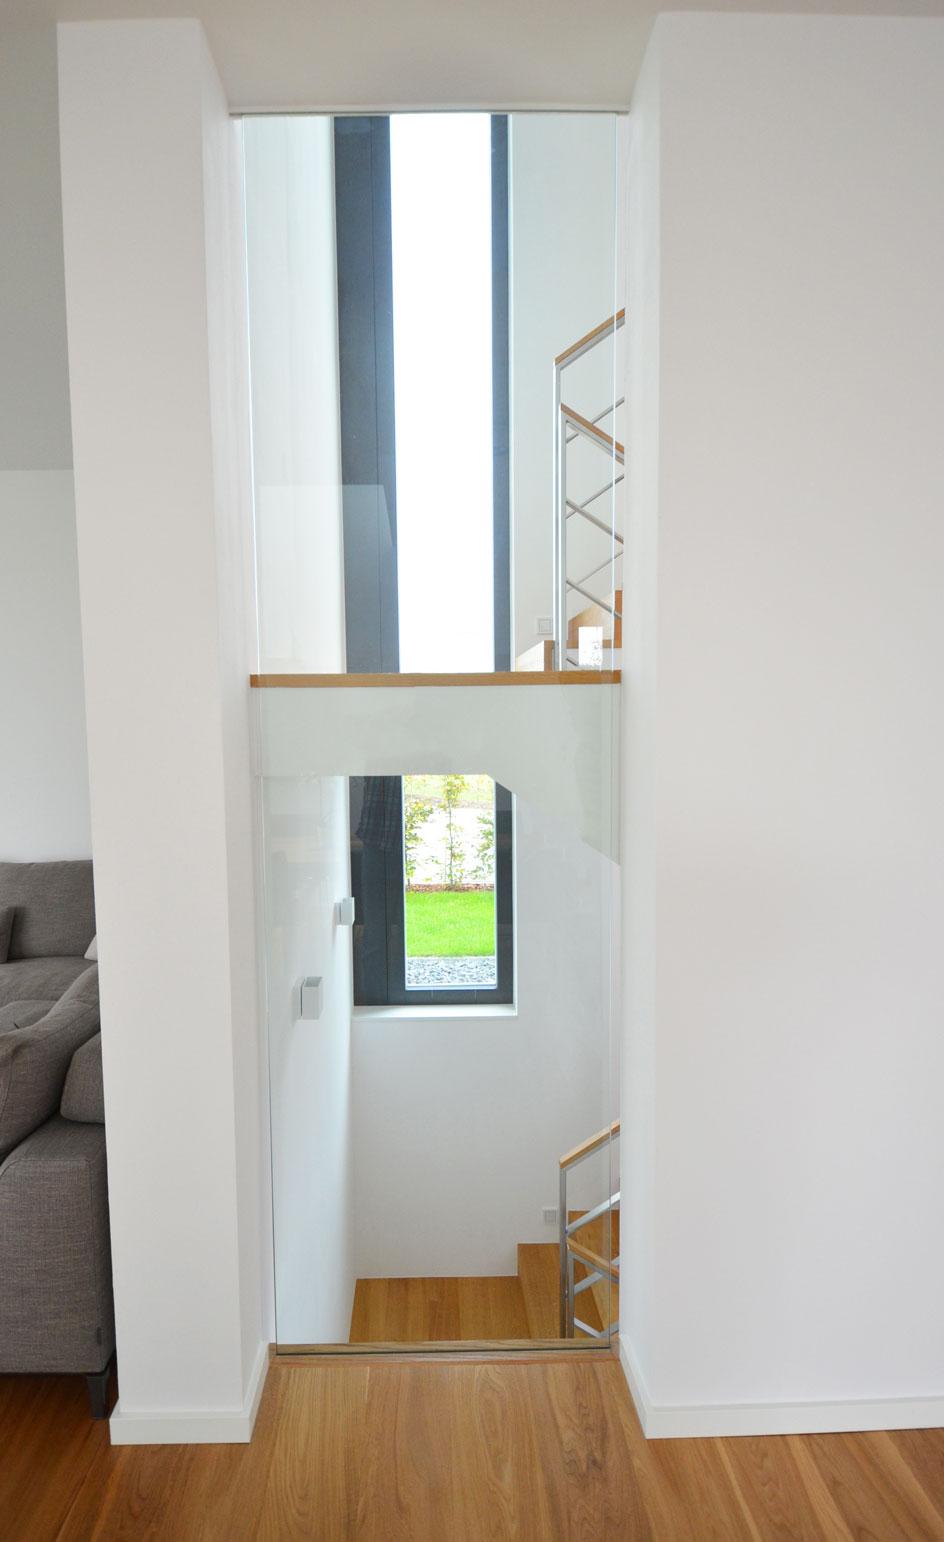 betontreppe mit holzbelag in frankfurt-reidberg